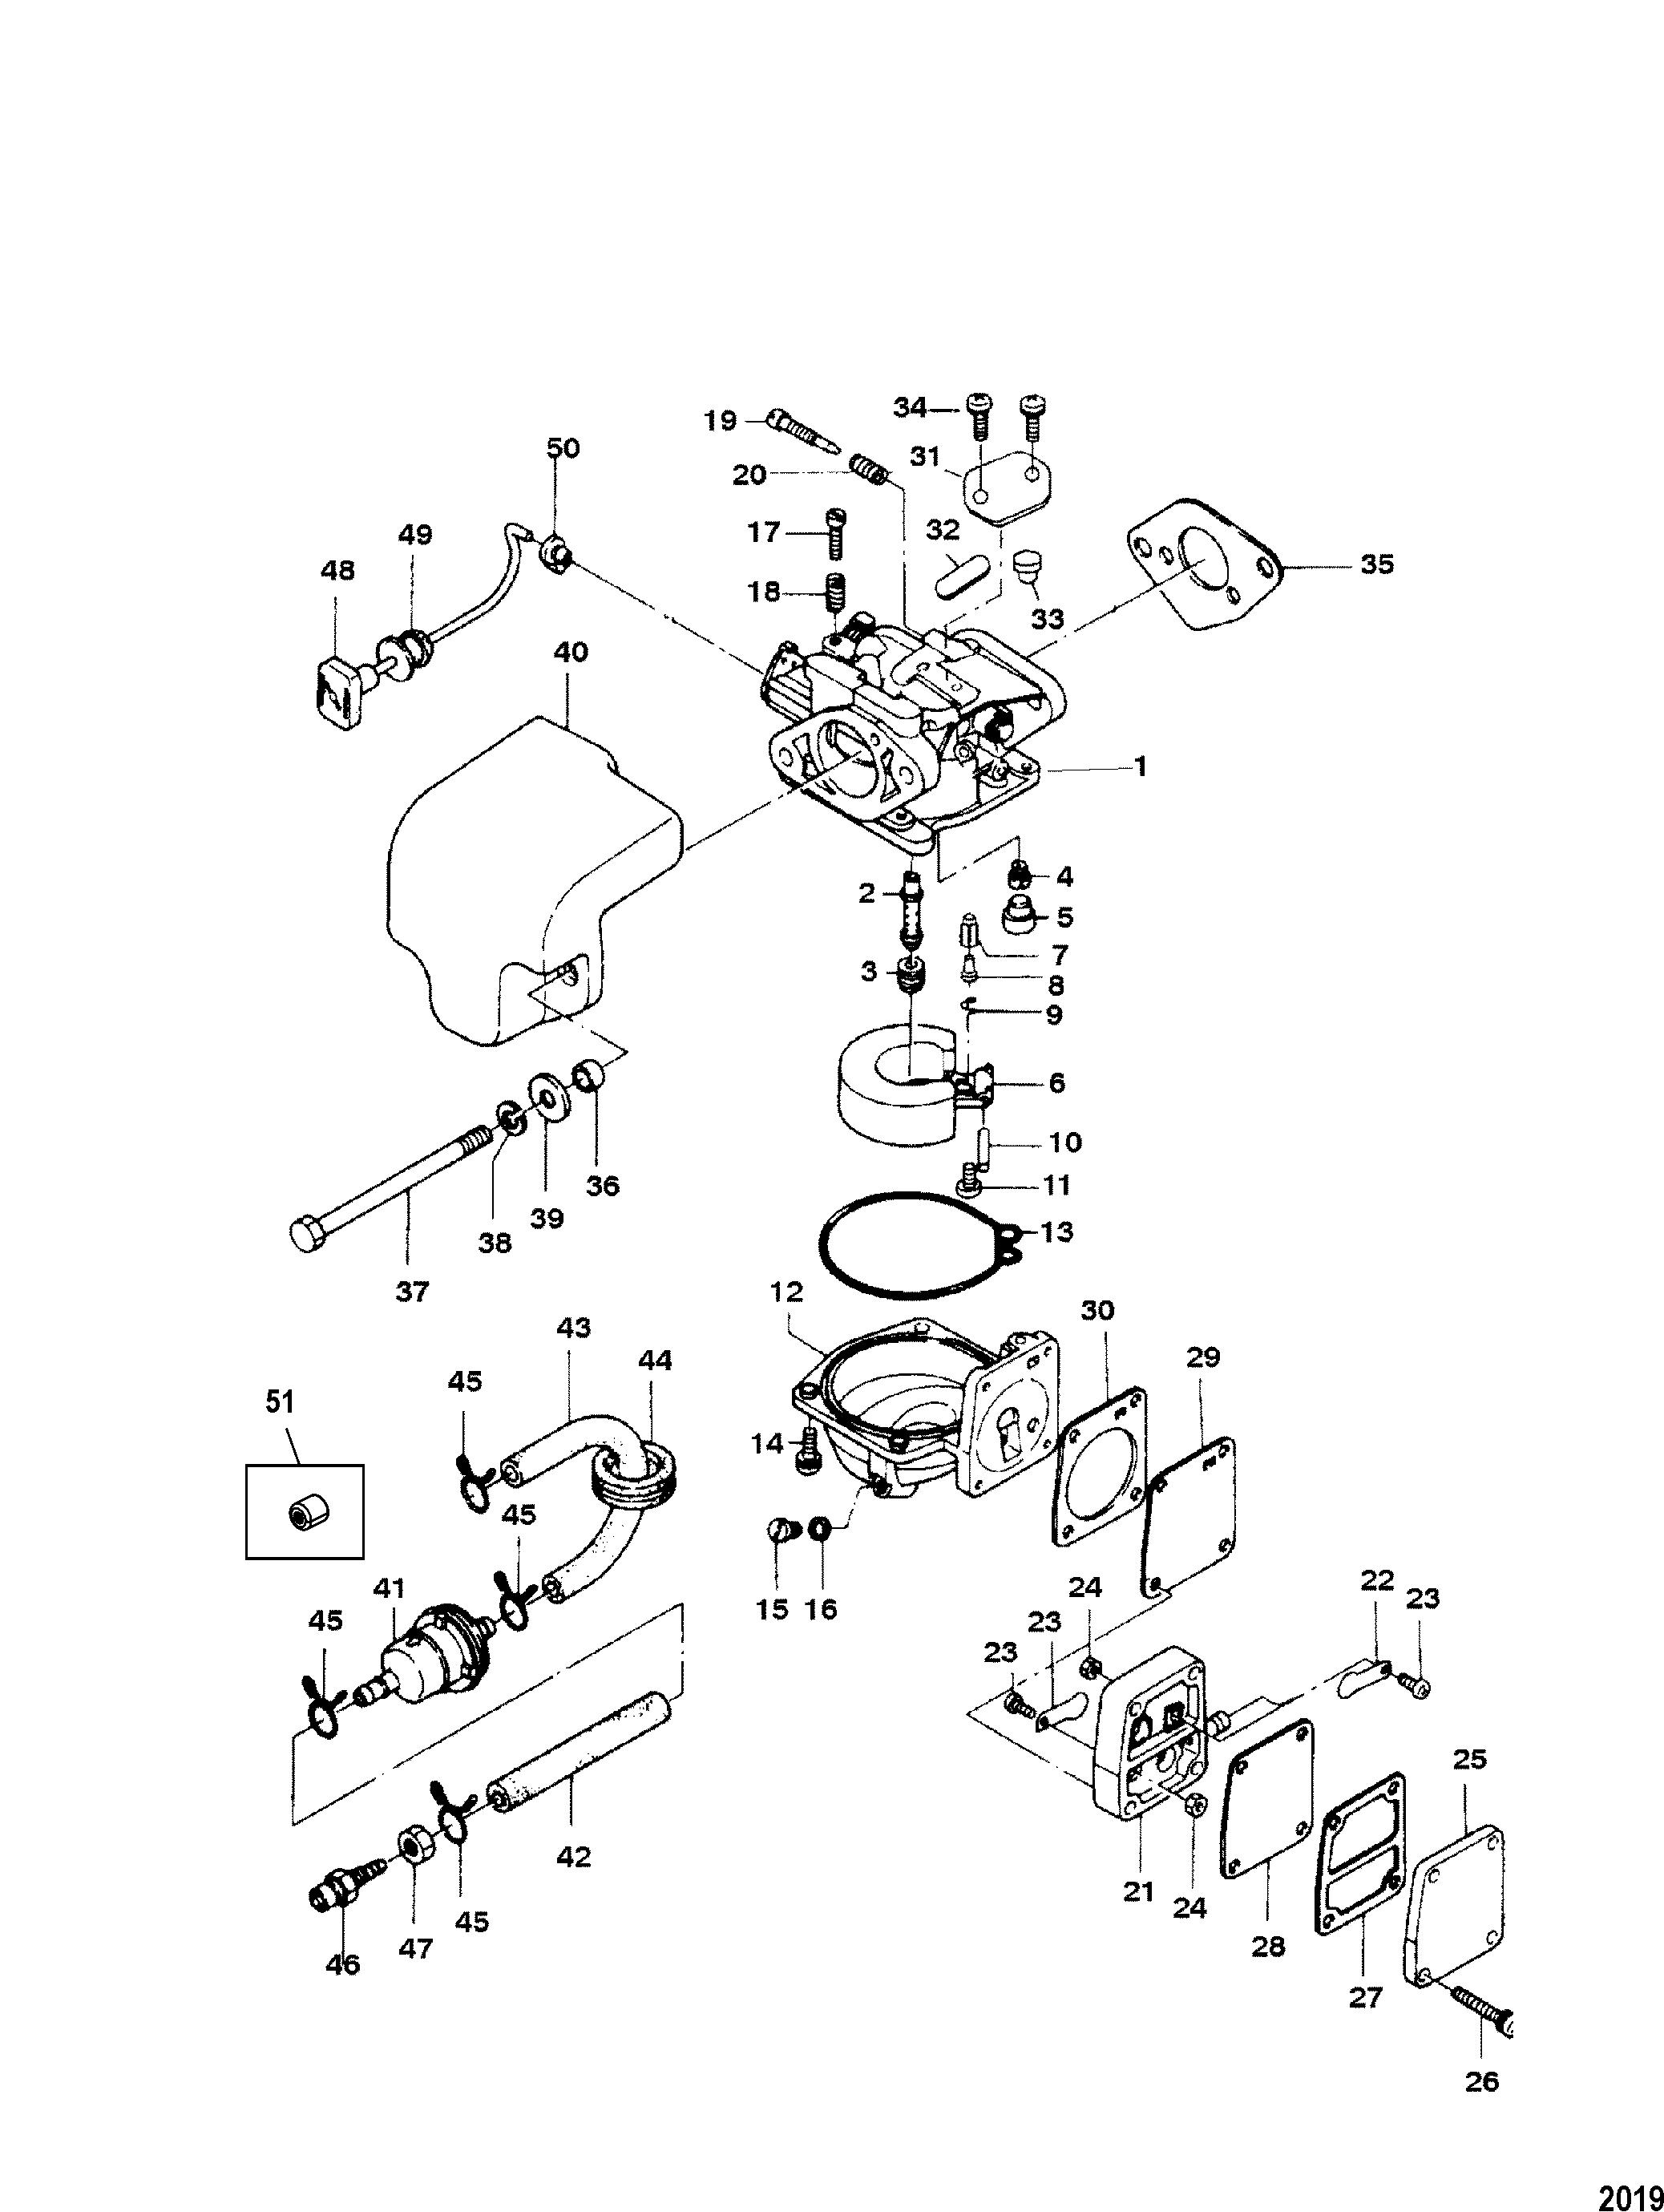 http://www.mercury-lakor.com/system/catalog/LSDATA/COMMON/2019.png